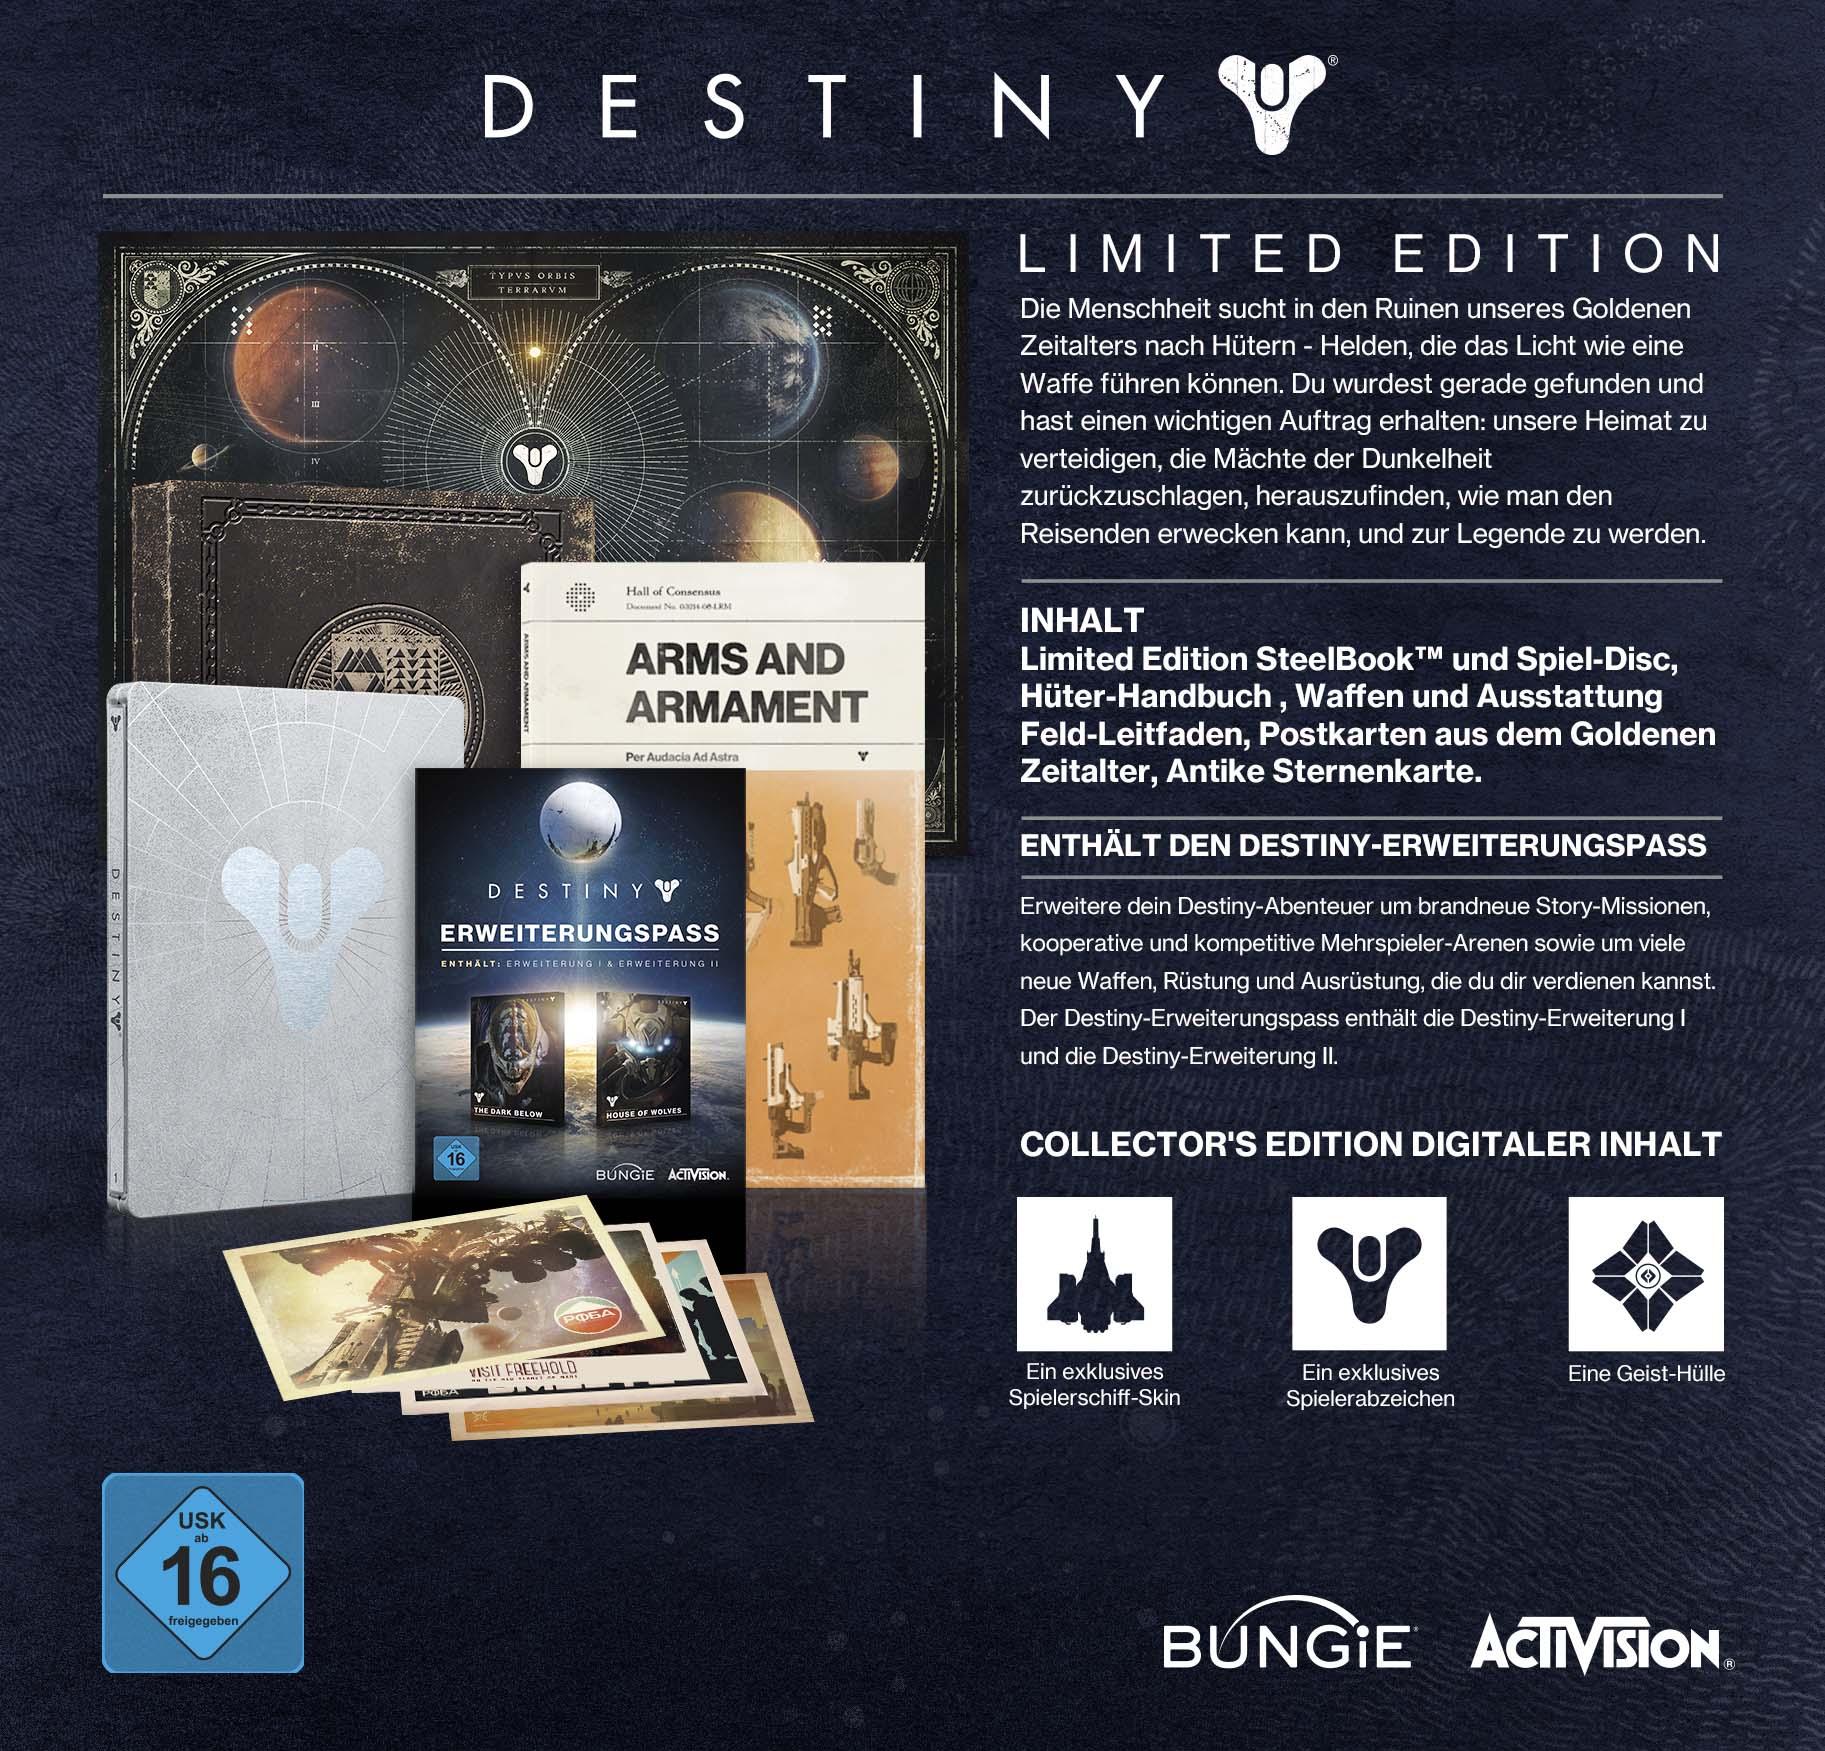 Destiny Limited Edition Inhalte